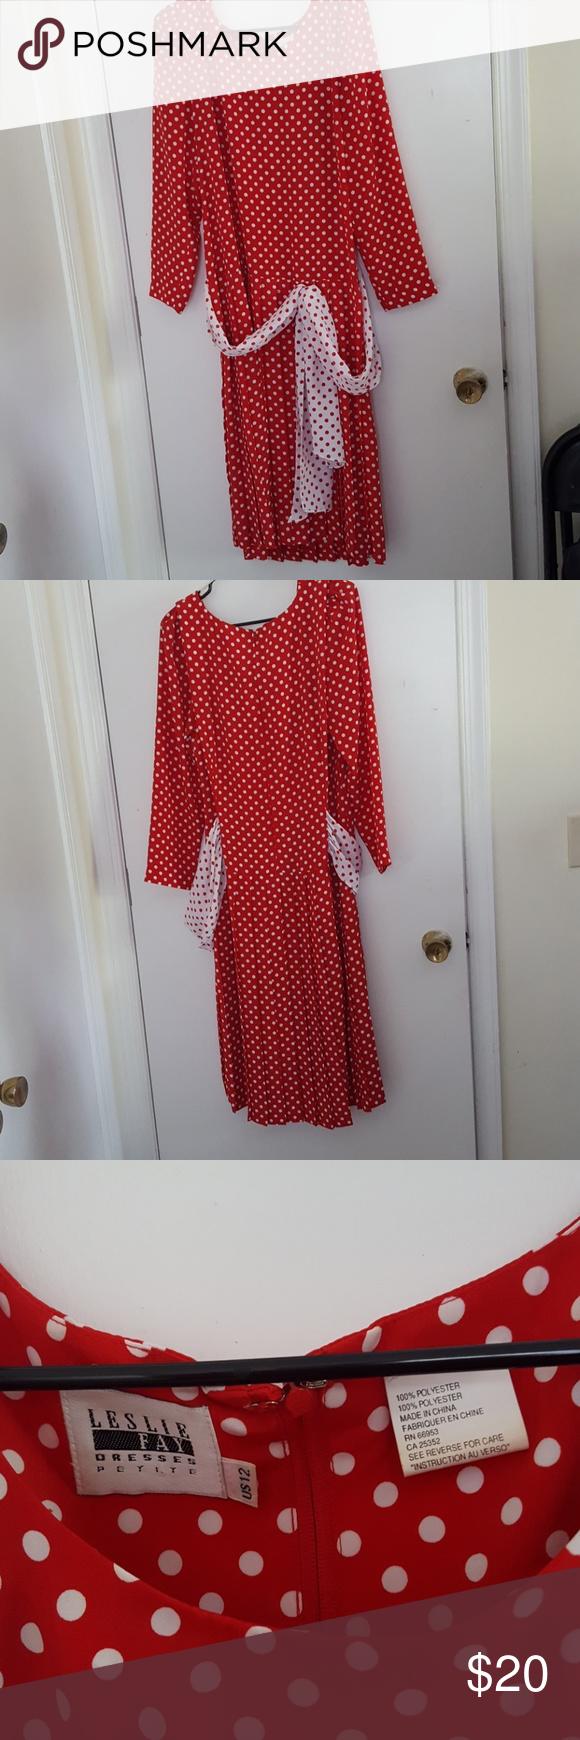 Leslie fay polkadot dress pinterest white polka dot dress